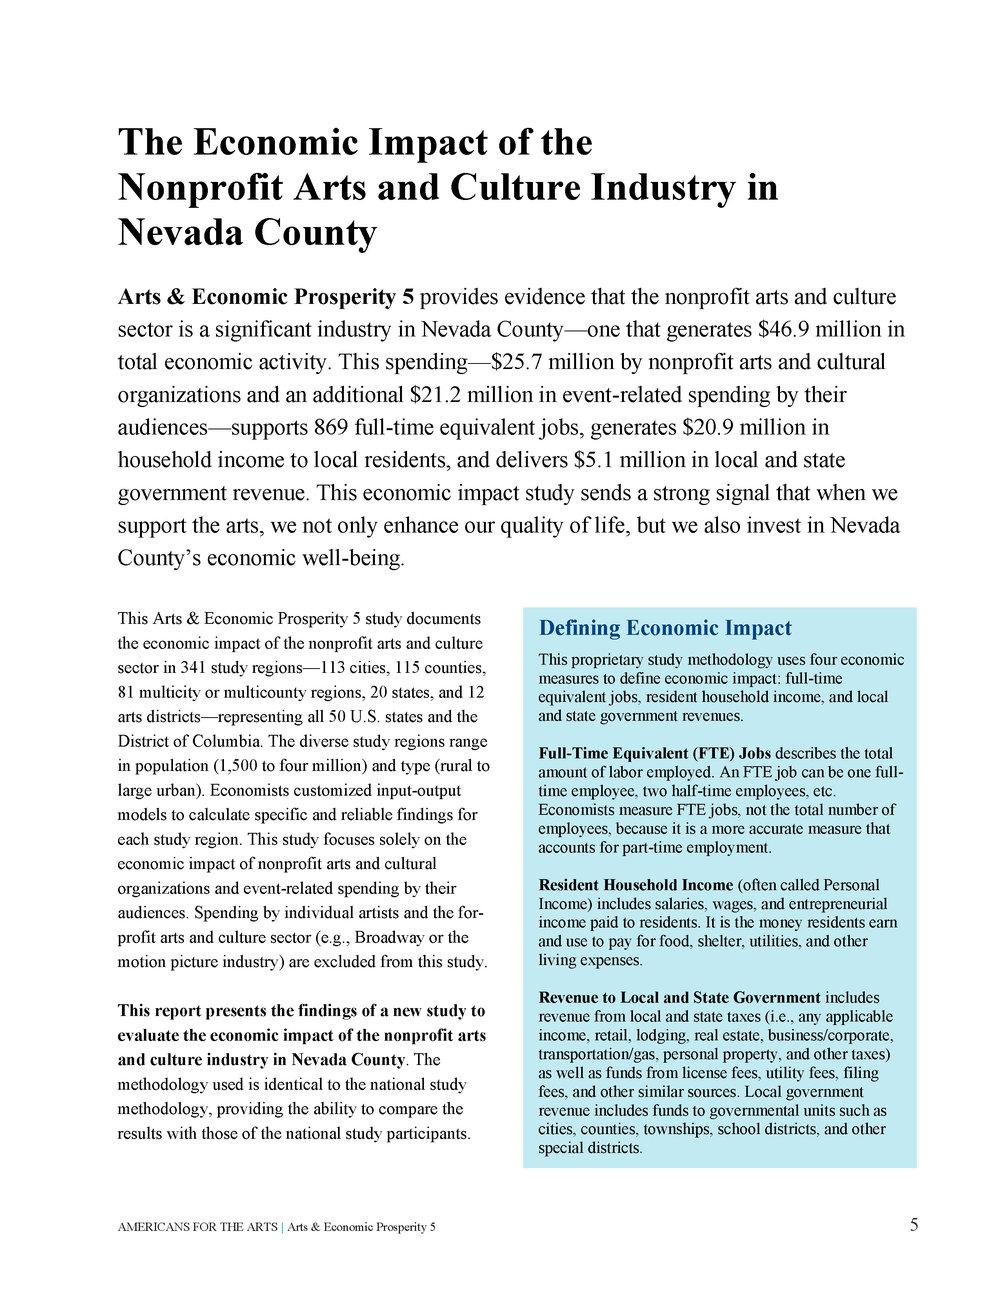 Arts & Economic Prosperity in Nevada County_Page_09.jpg